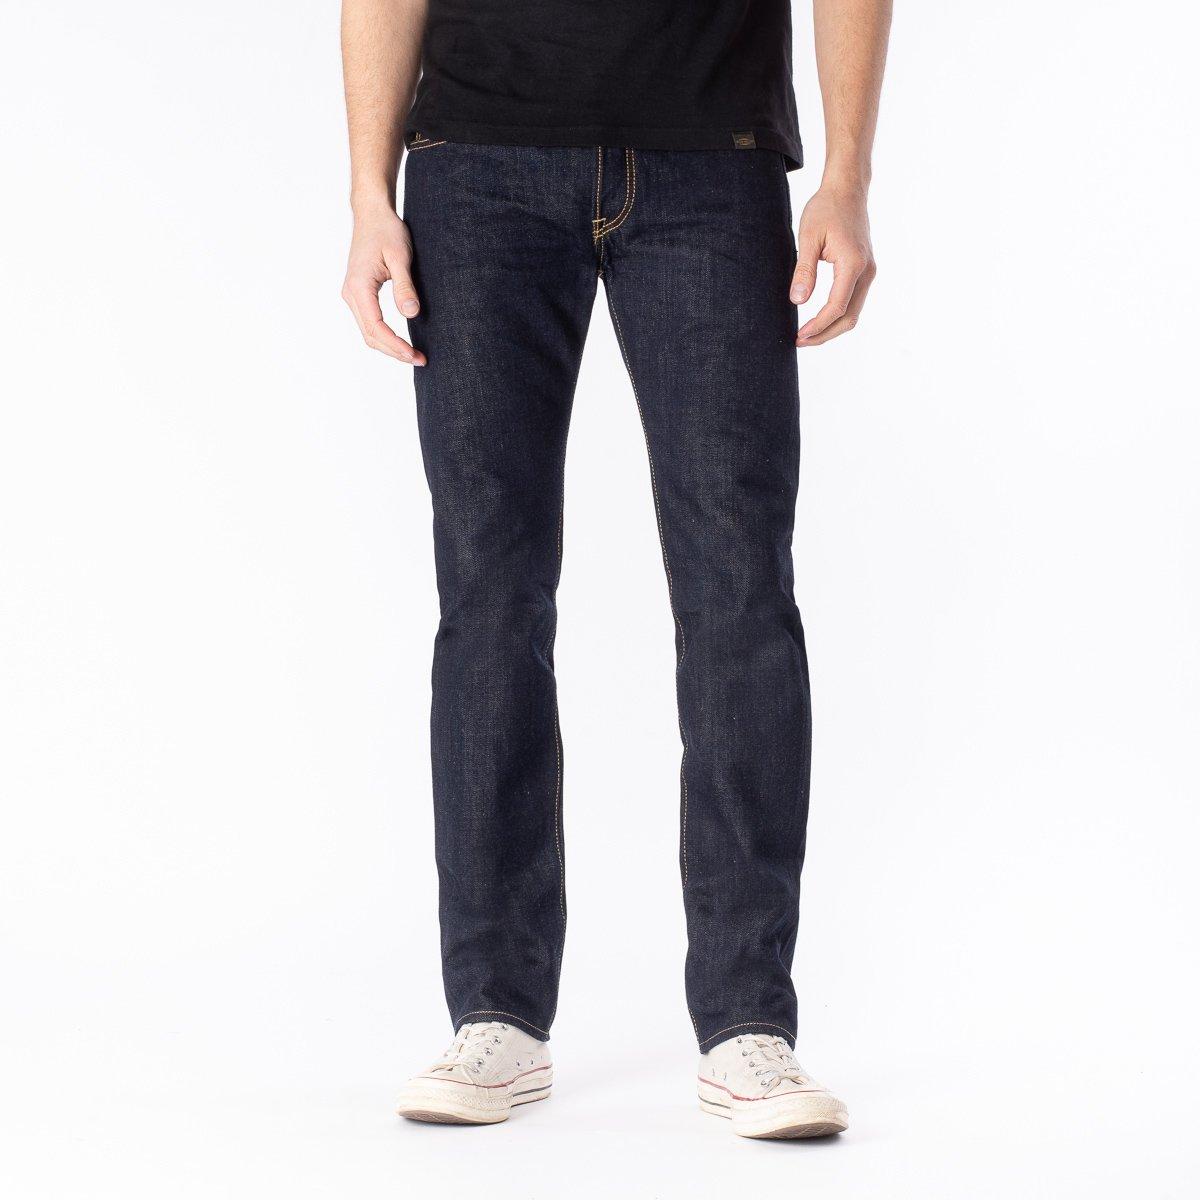 Iron Heart IH-777N 17 oz. Selvedge Denim Slim Tapered Cut Jeans